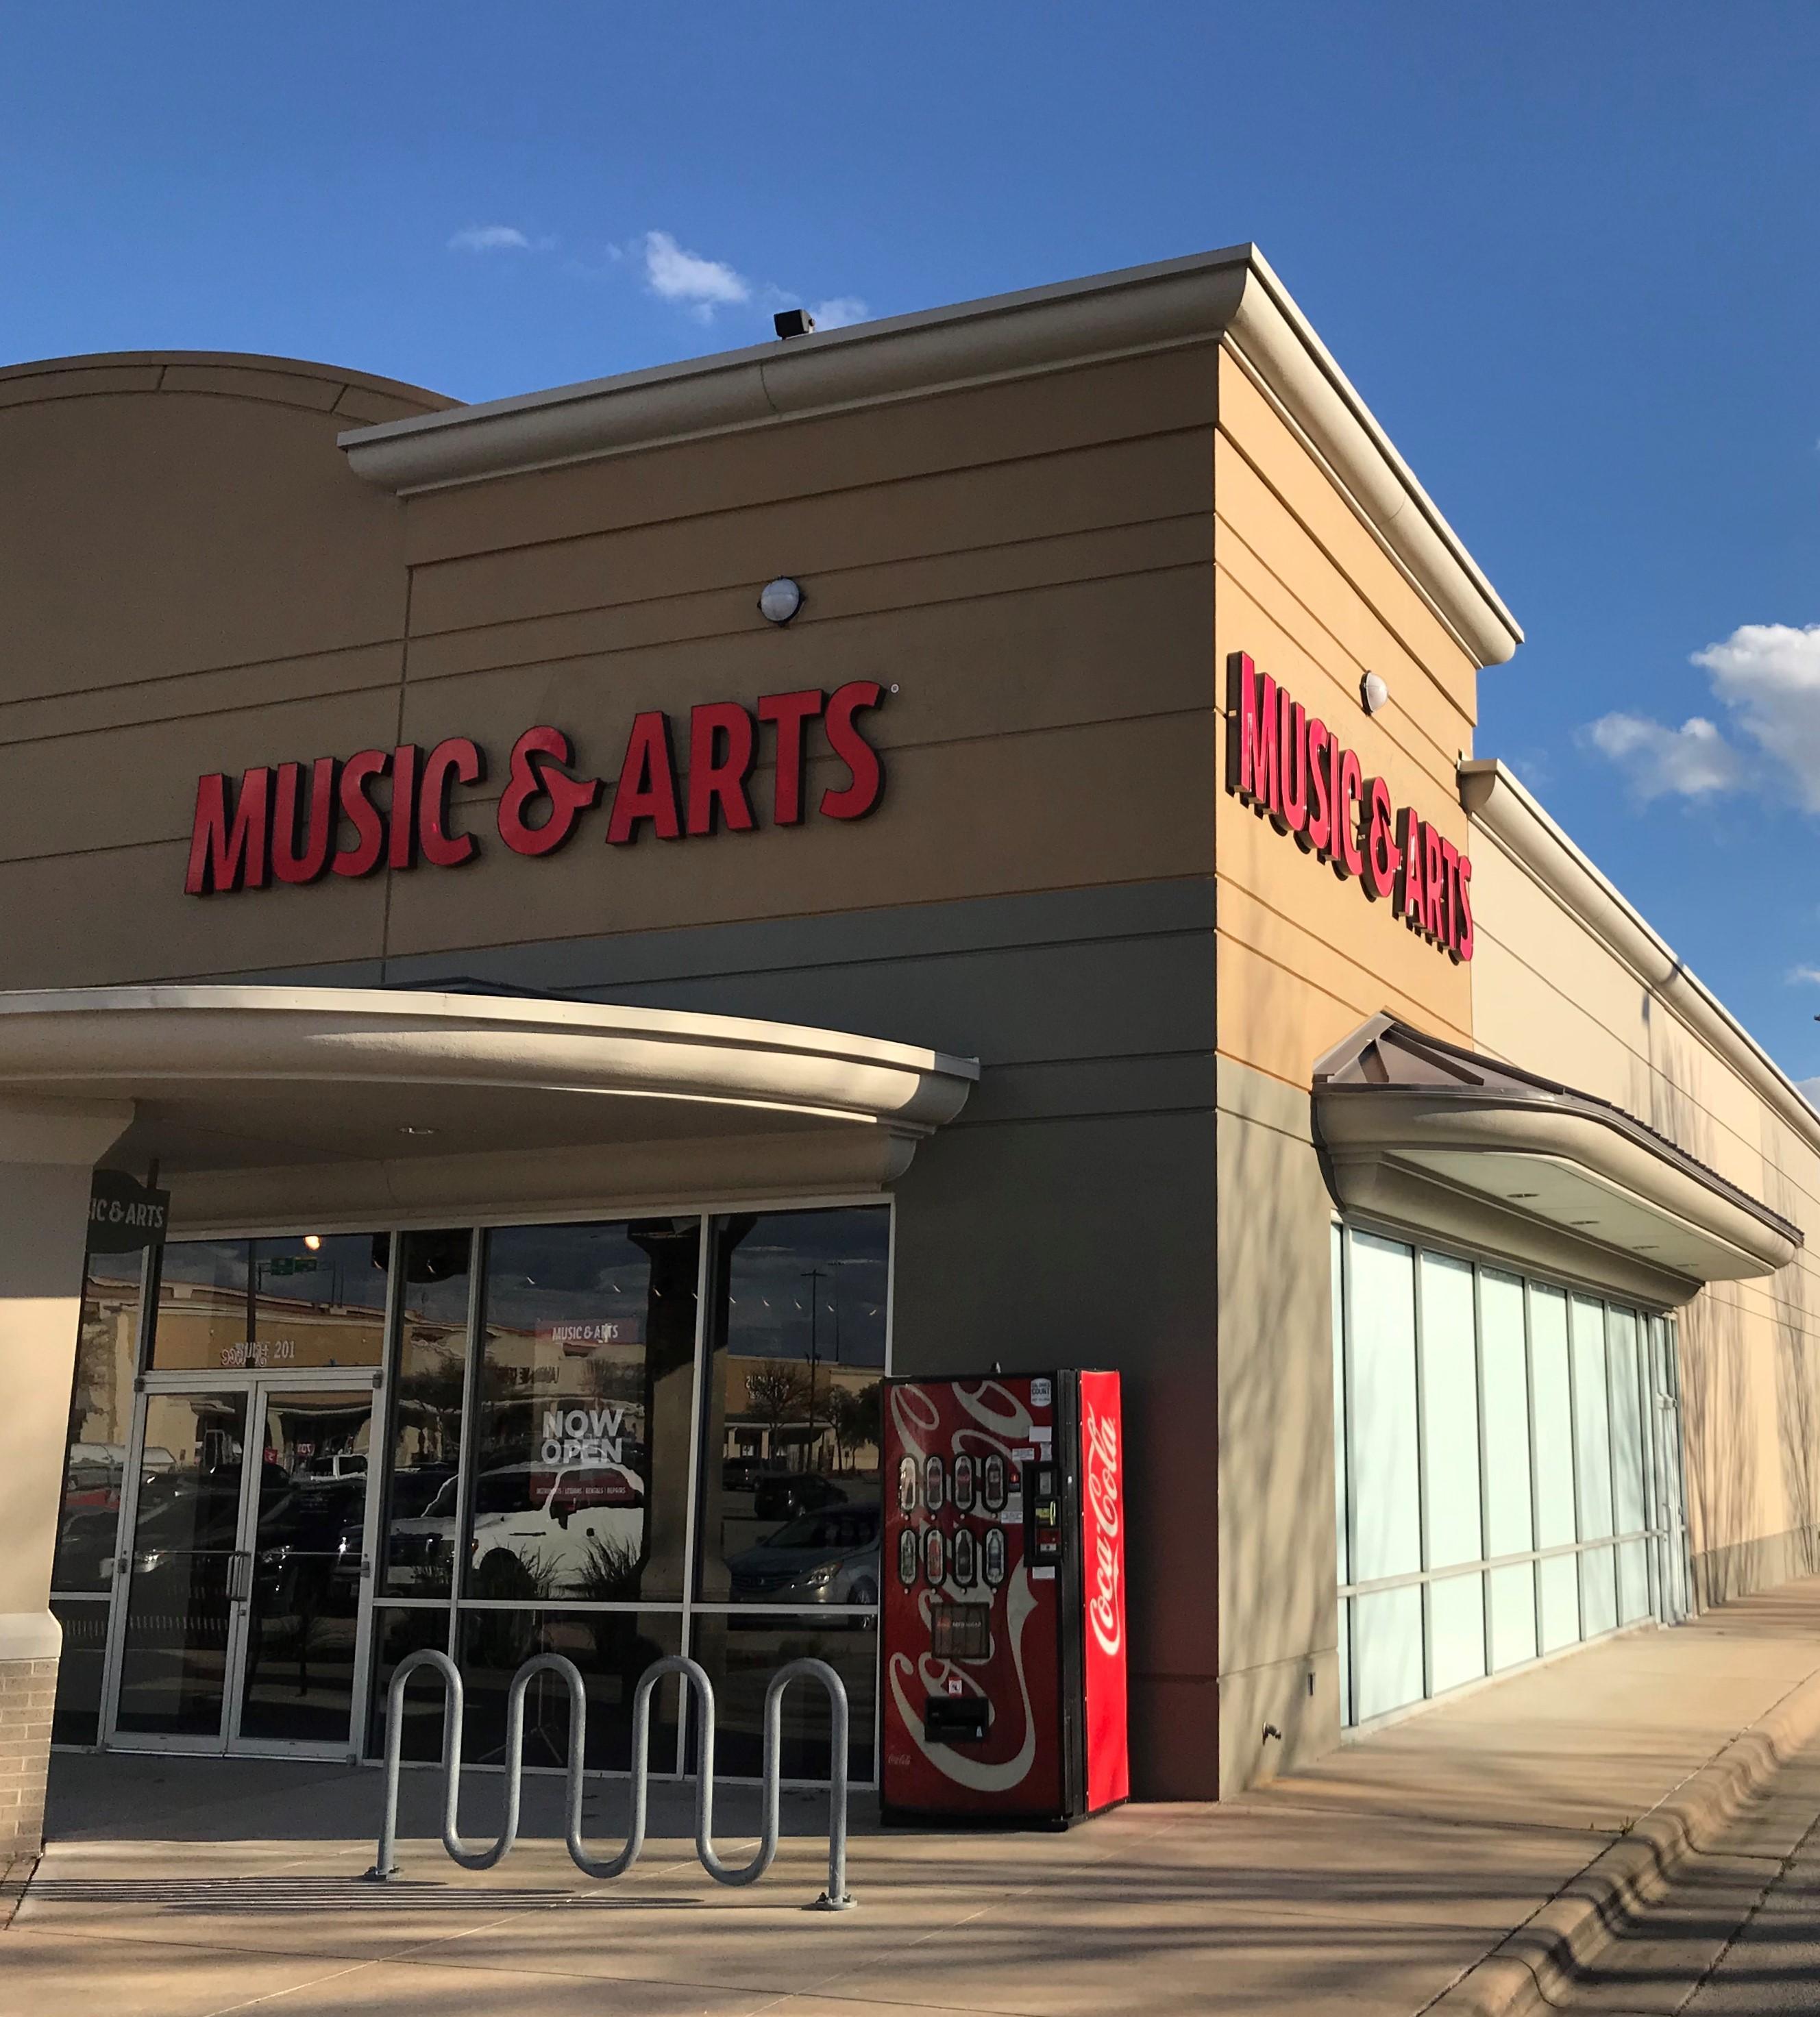 Instrument Rentals & Music Lessons in Cedar Park, TX, TX